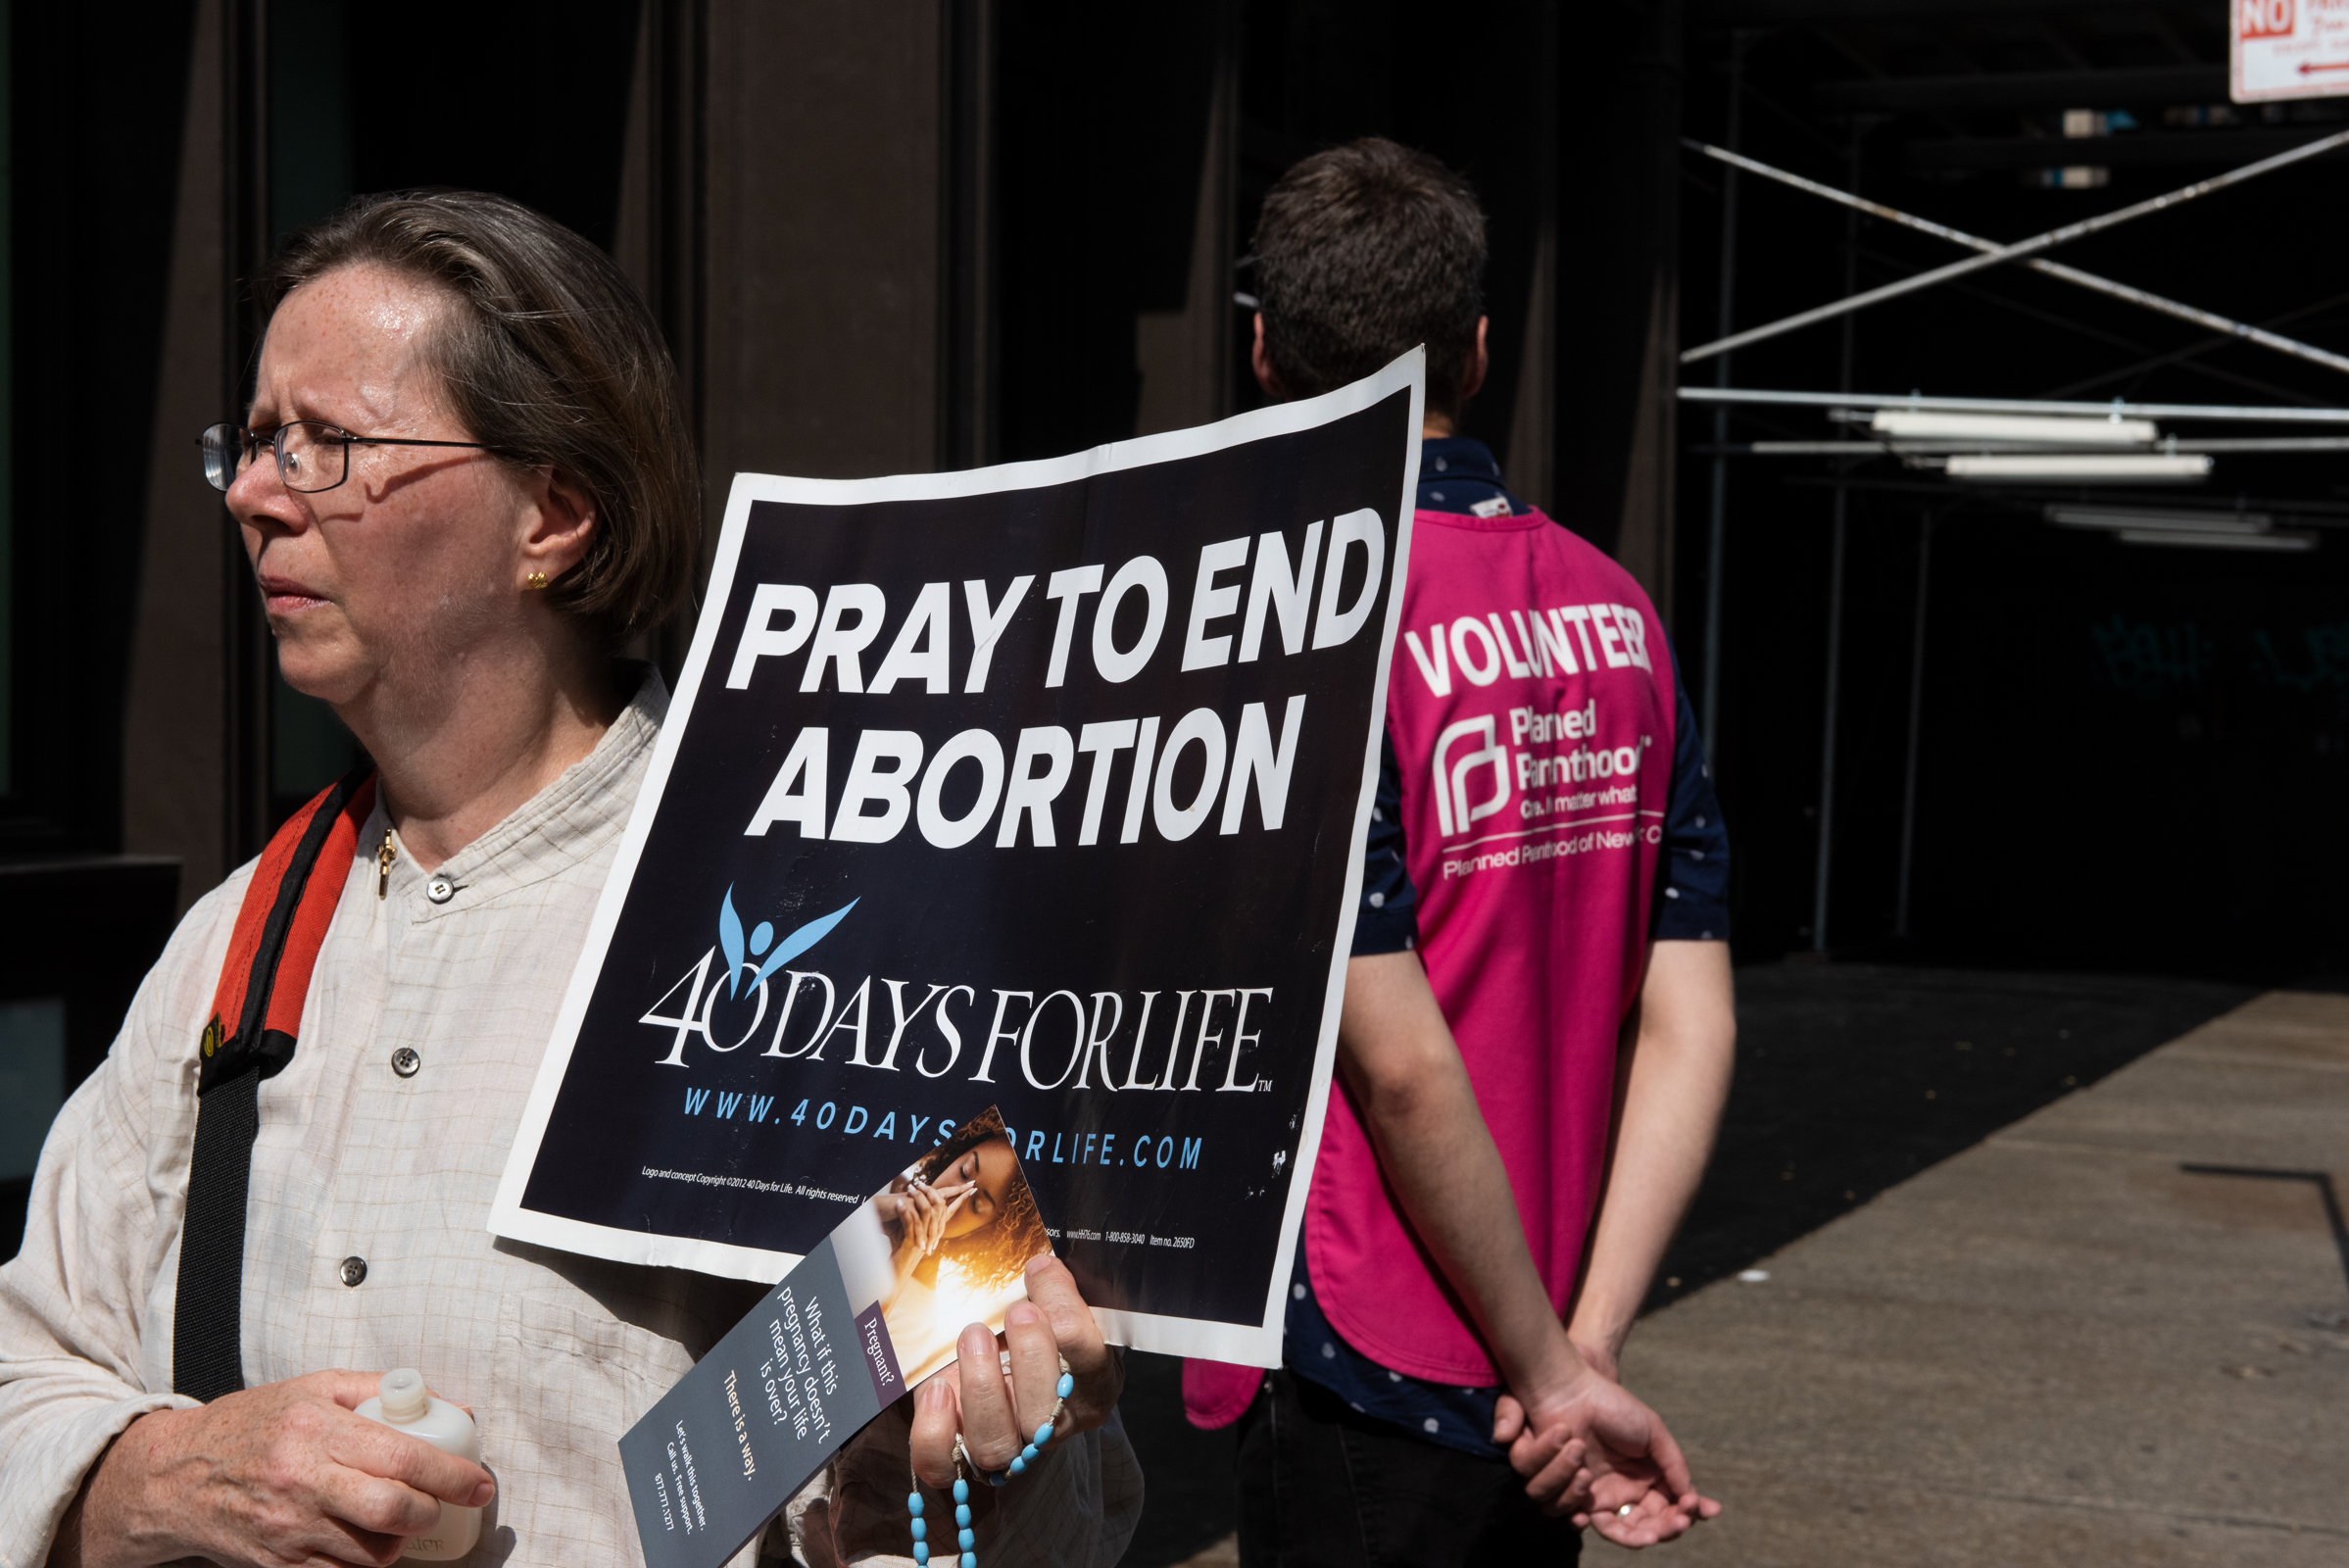 ABORTION,PLANNED PARENTHOOD,NEW YORK